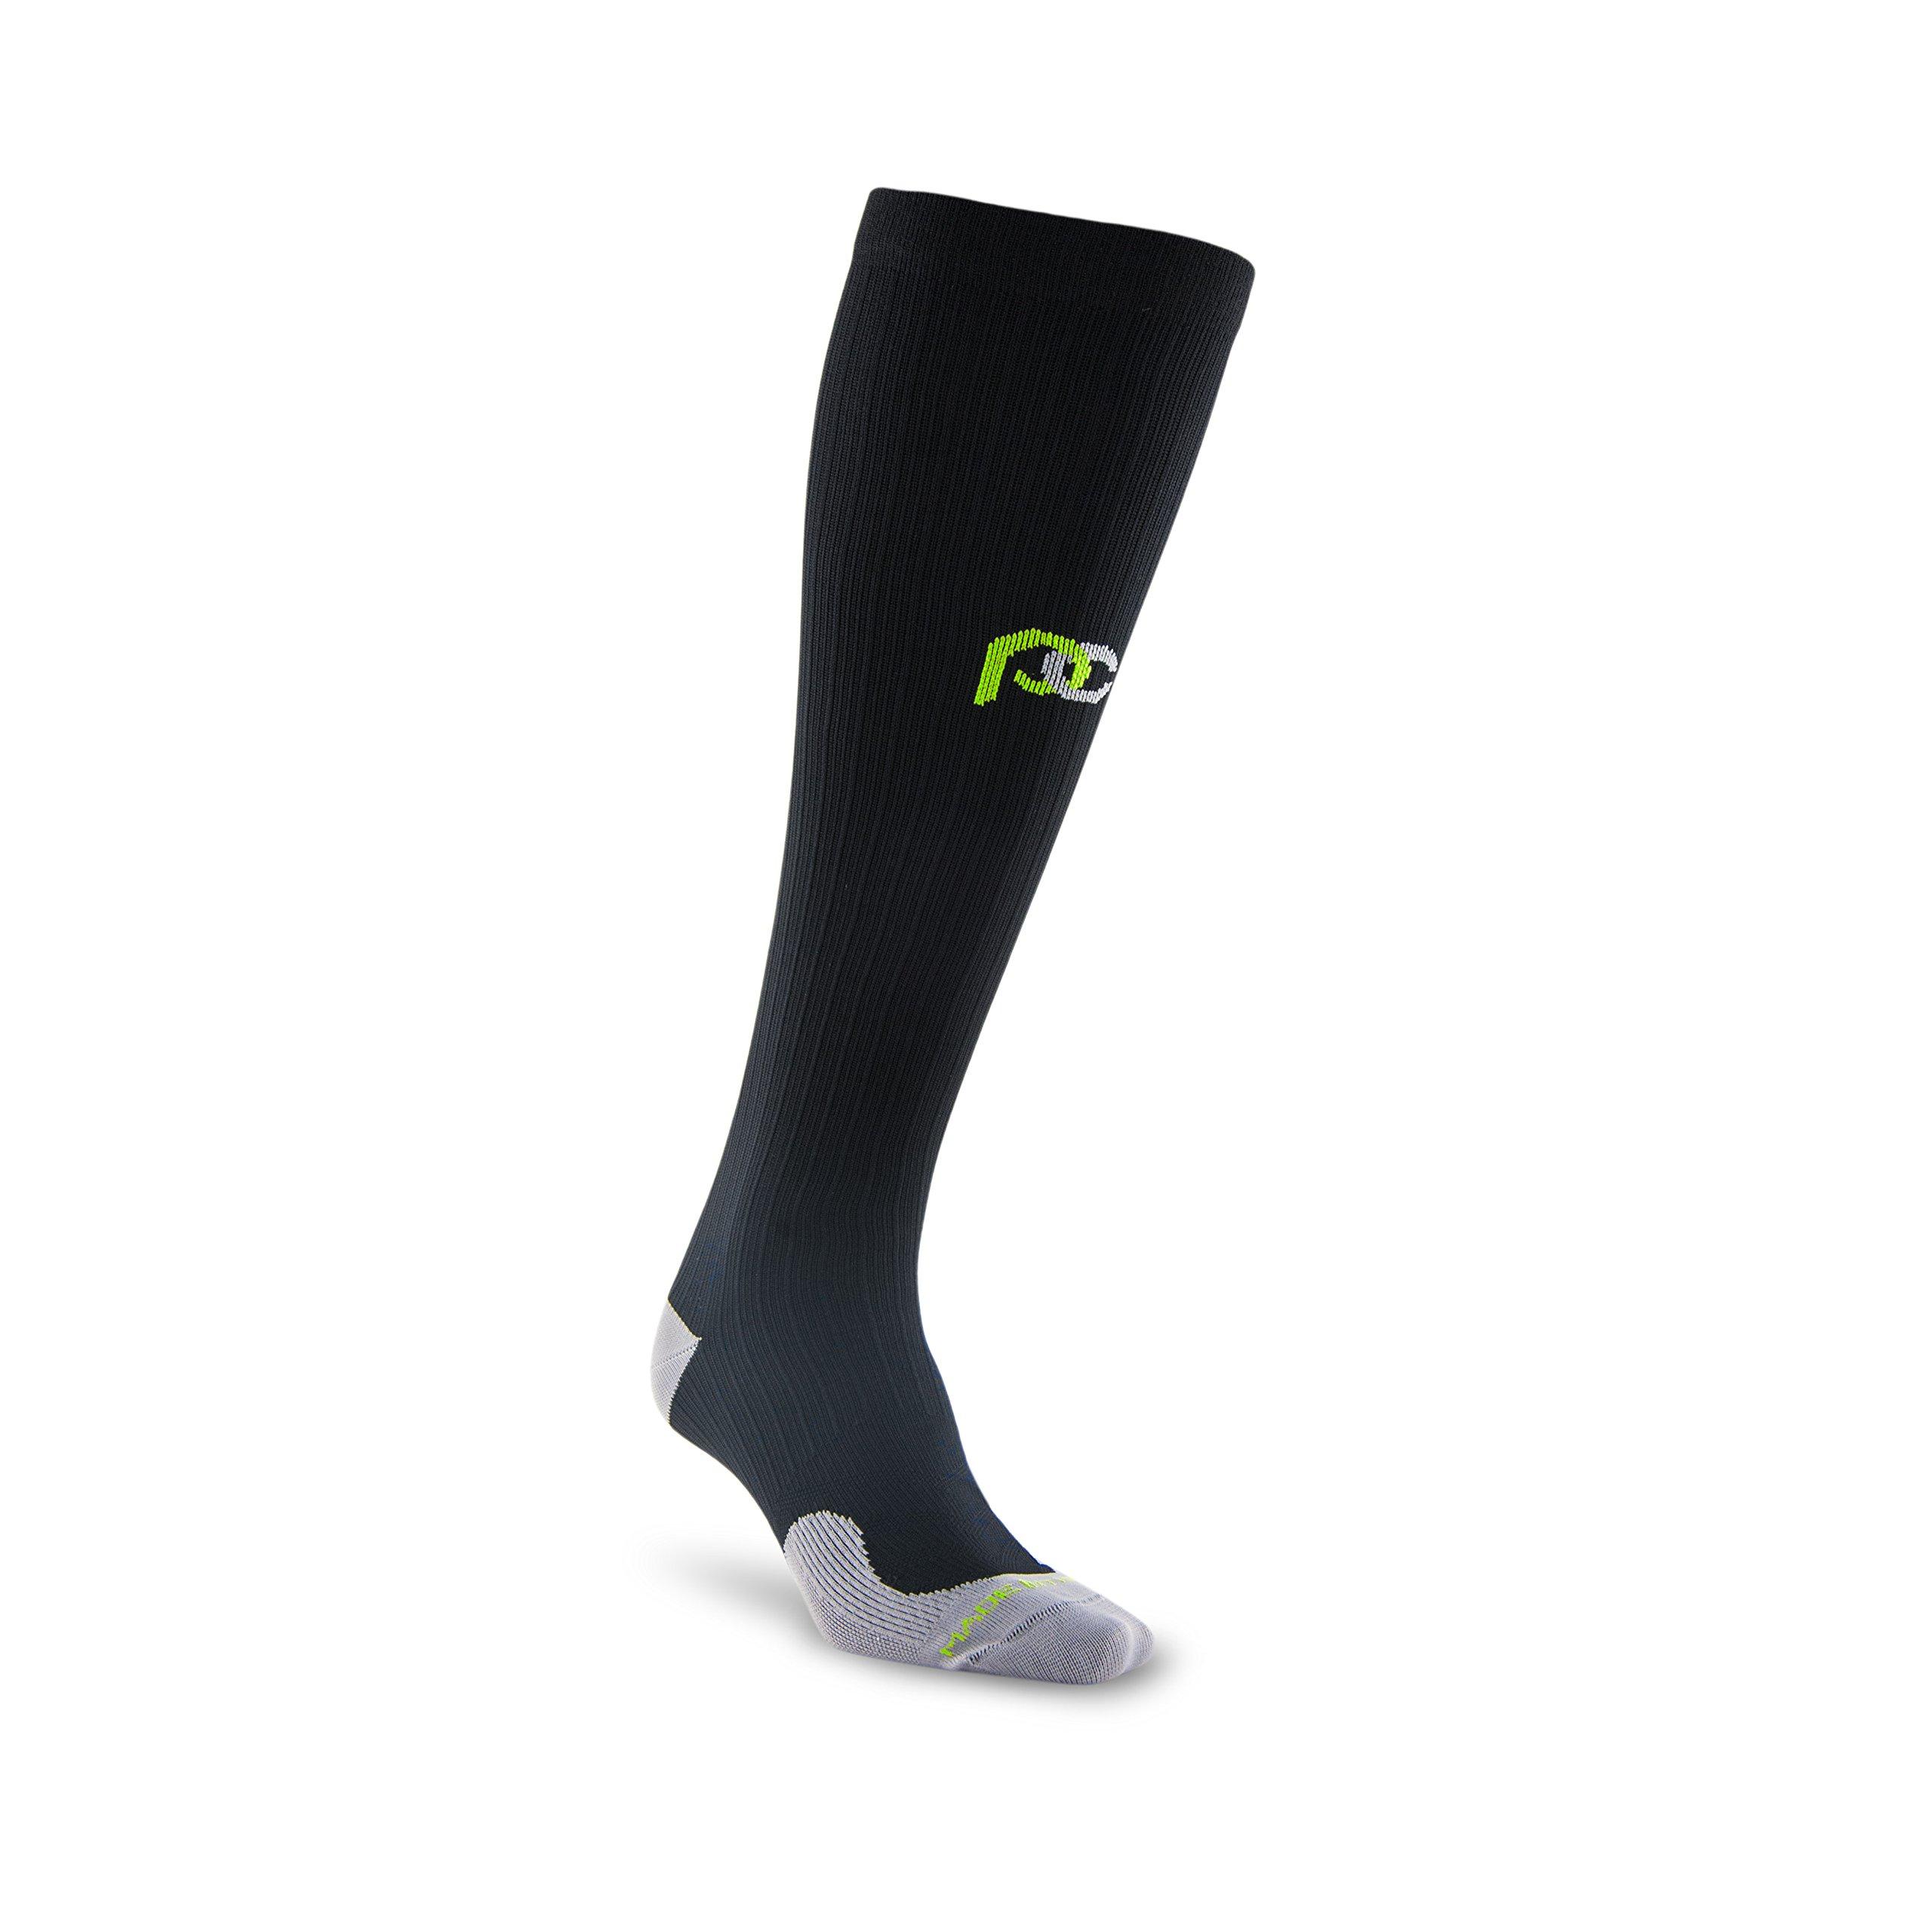 PRO Compression: Marathon (Full-Length, Over-the-Calf) Compression Socks, Black, Large/X-Large by PRO Compression